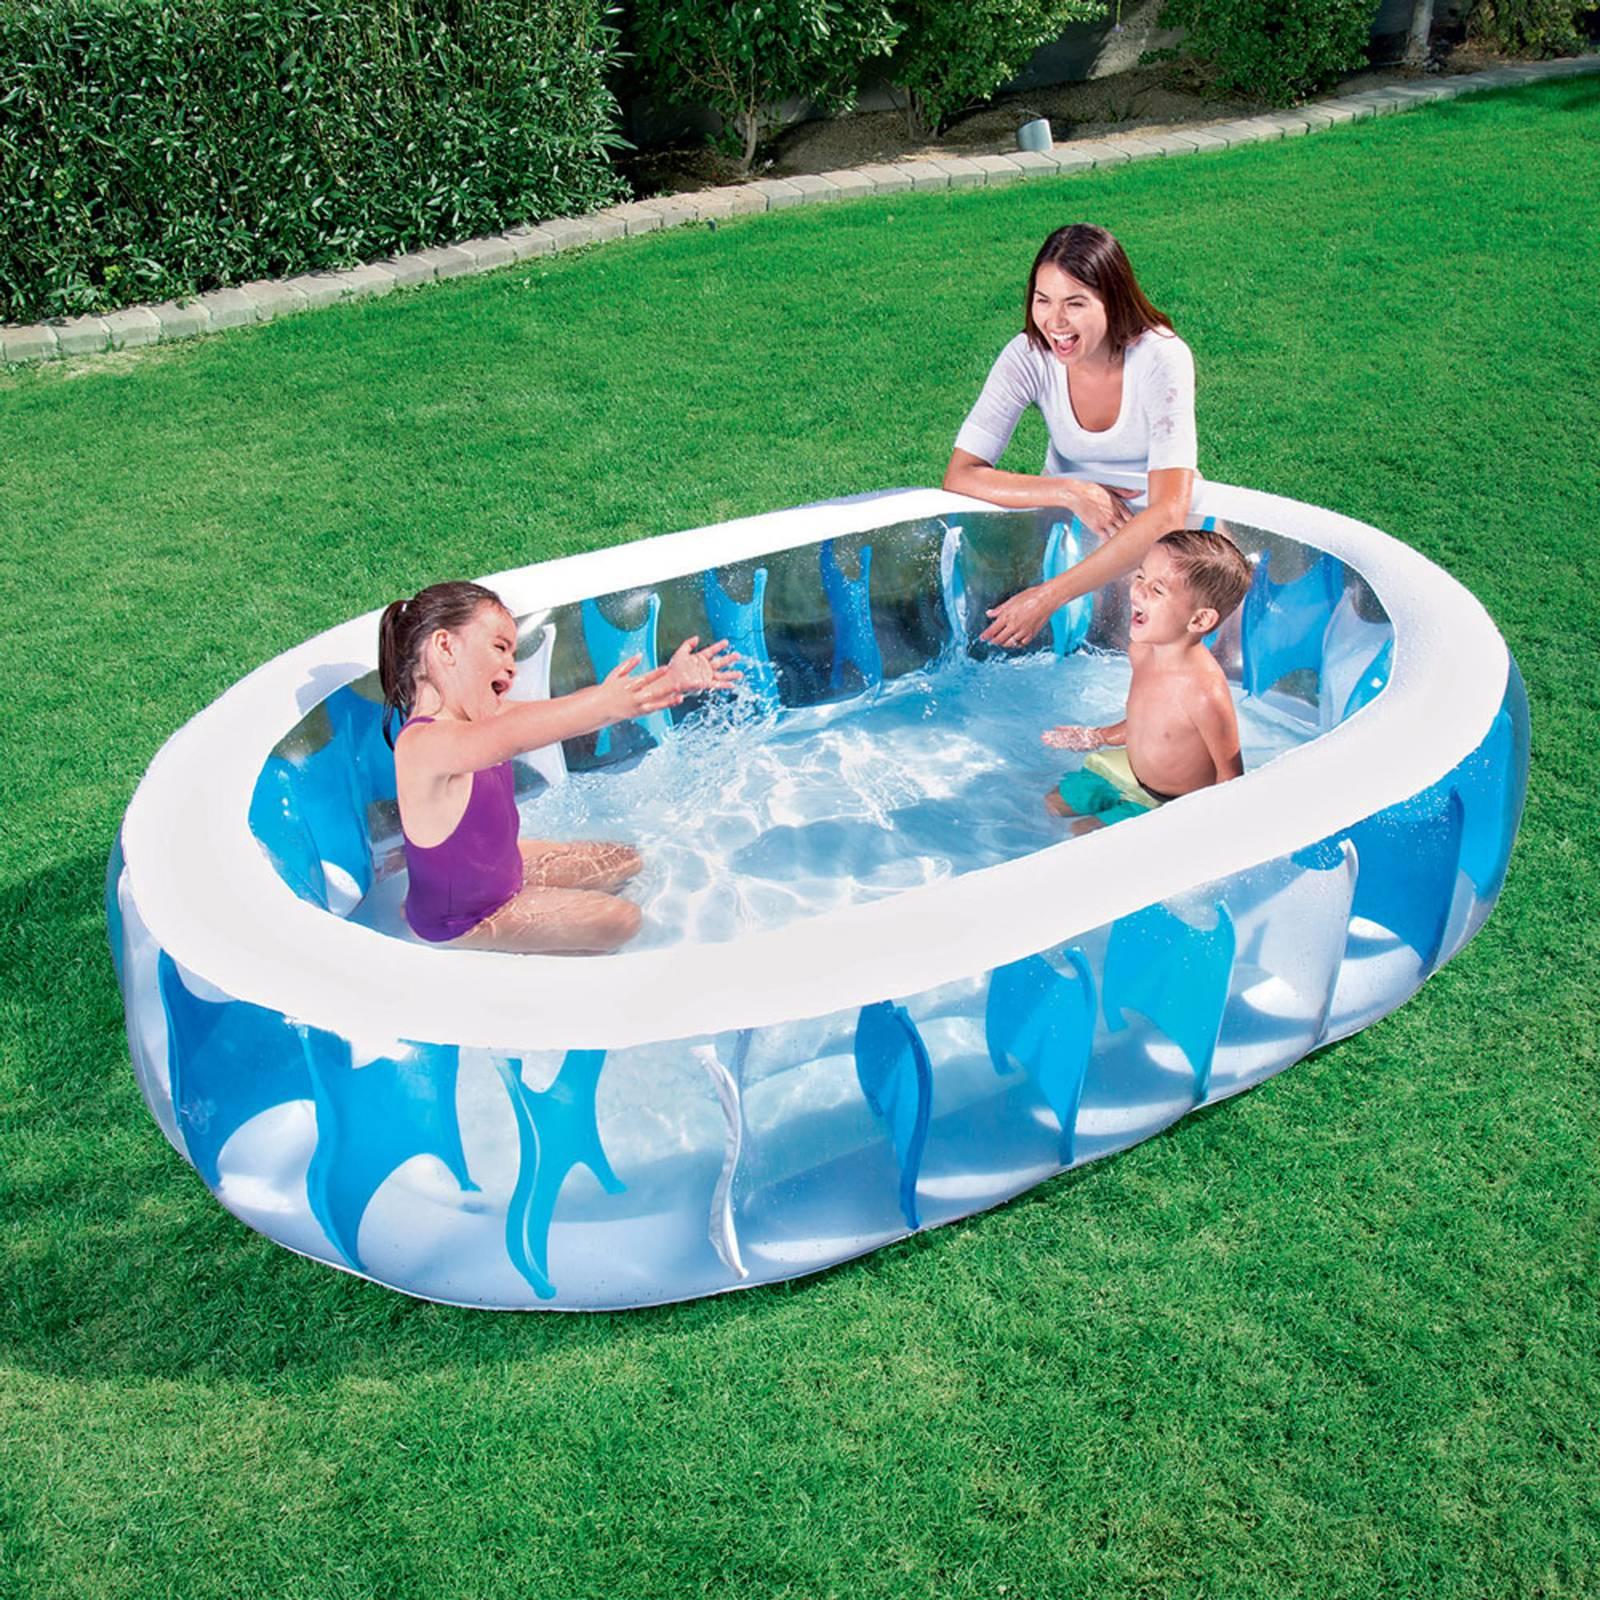 Basen dmuchany Eliptic Pool 229 x 152 x 51 cm BESTWAY – MIX KOLORÓW